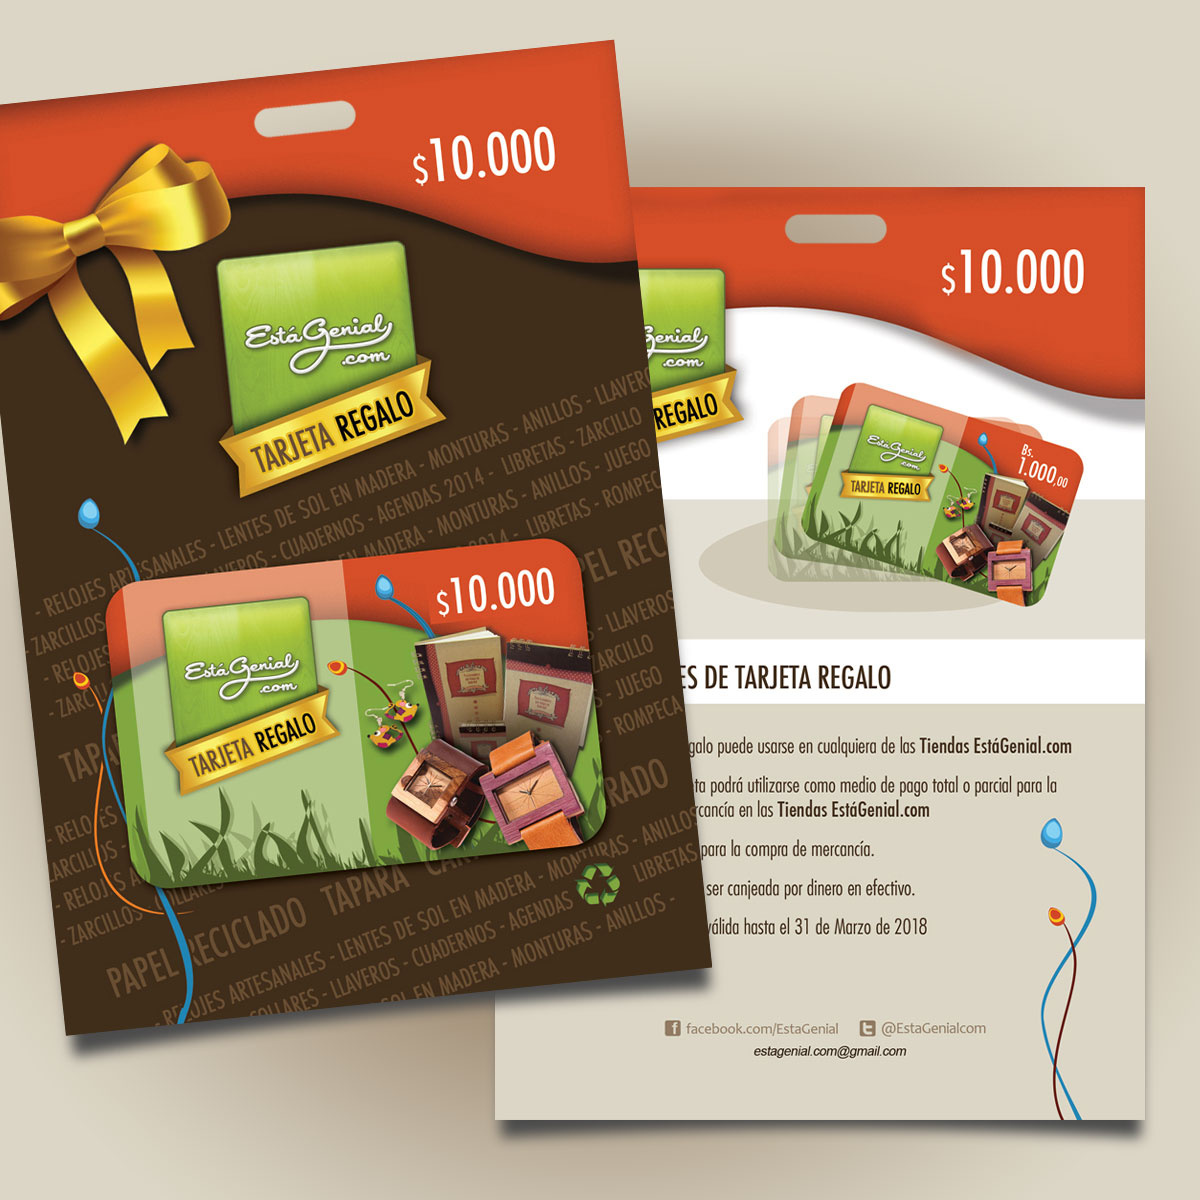 https://0201.nccdn.net/4_2/000/000/03f/ac7/giftcard-1200x1200.jpg